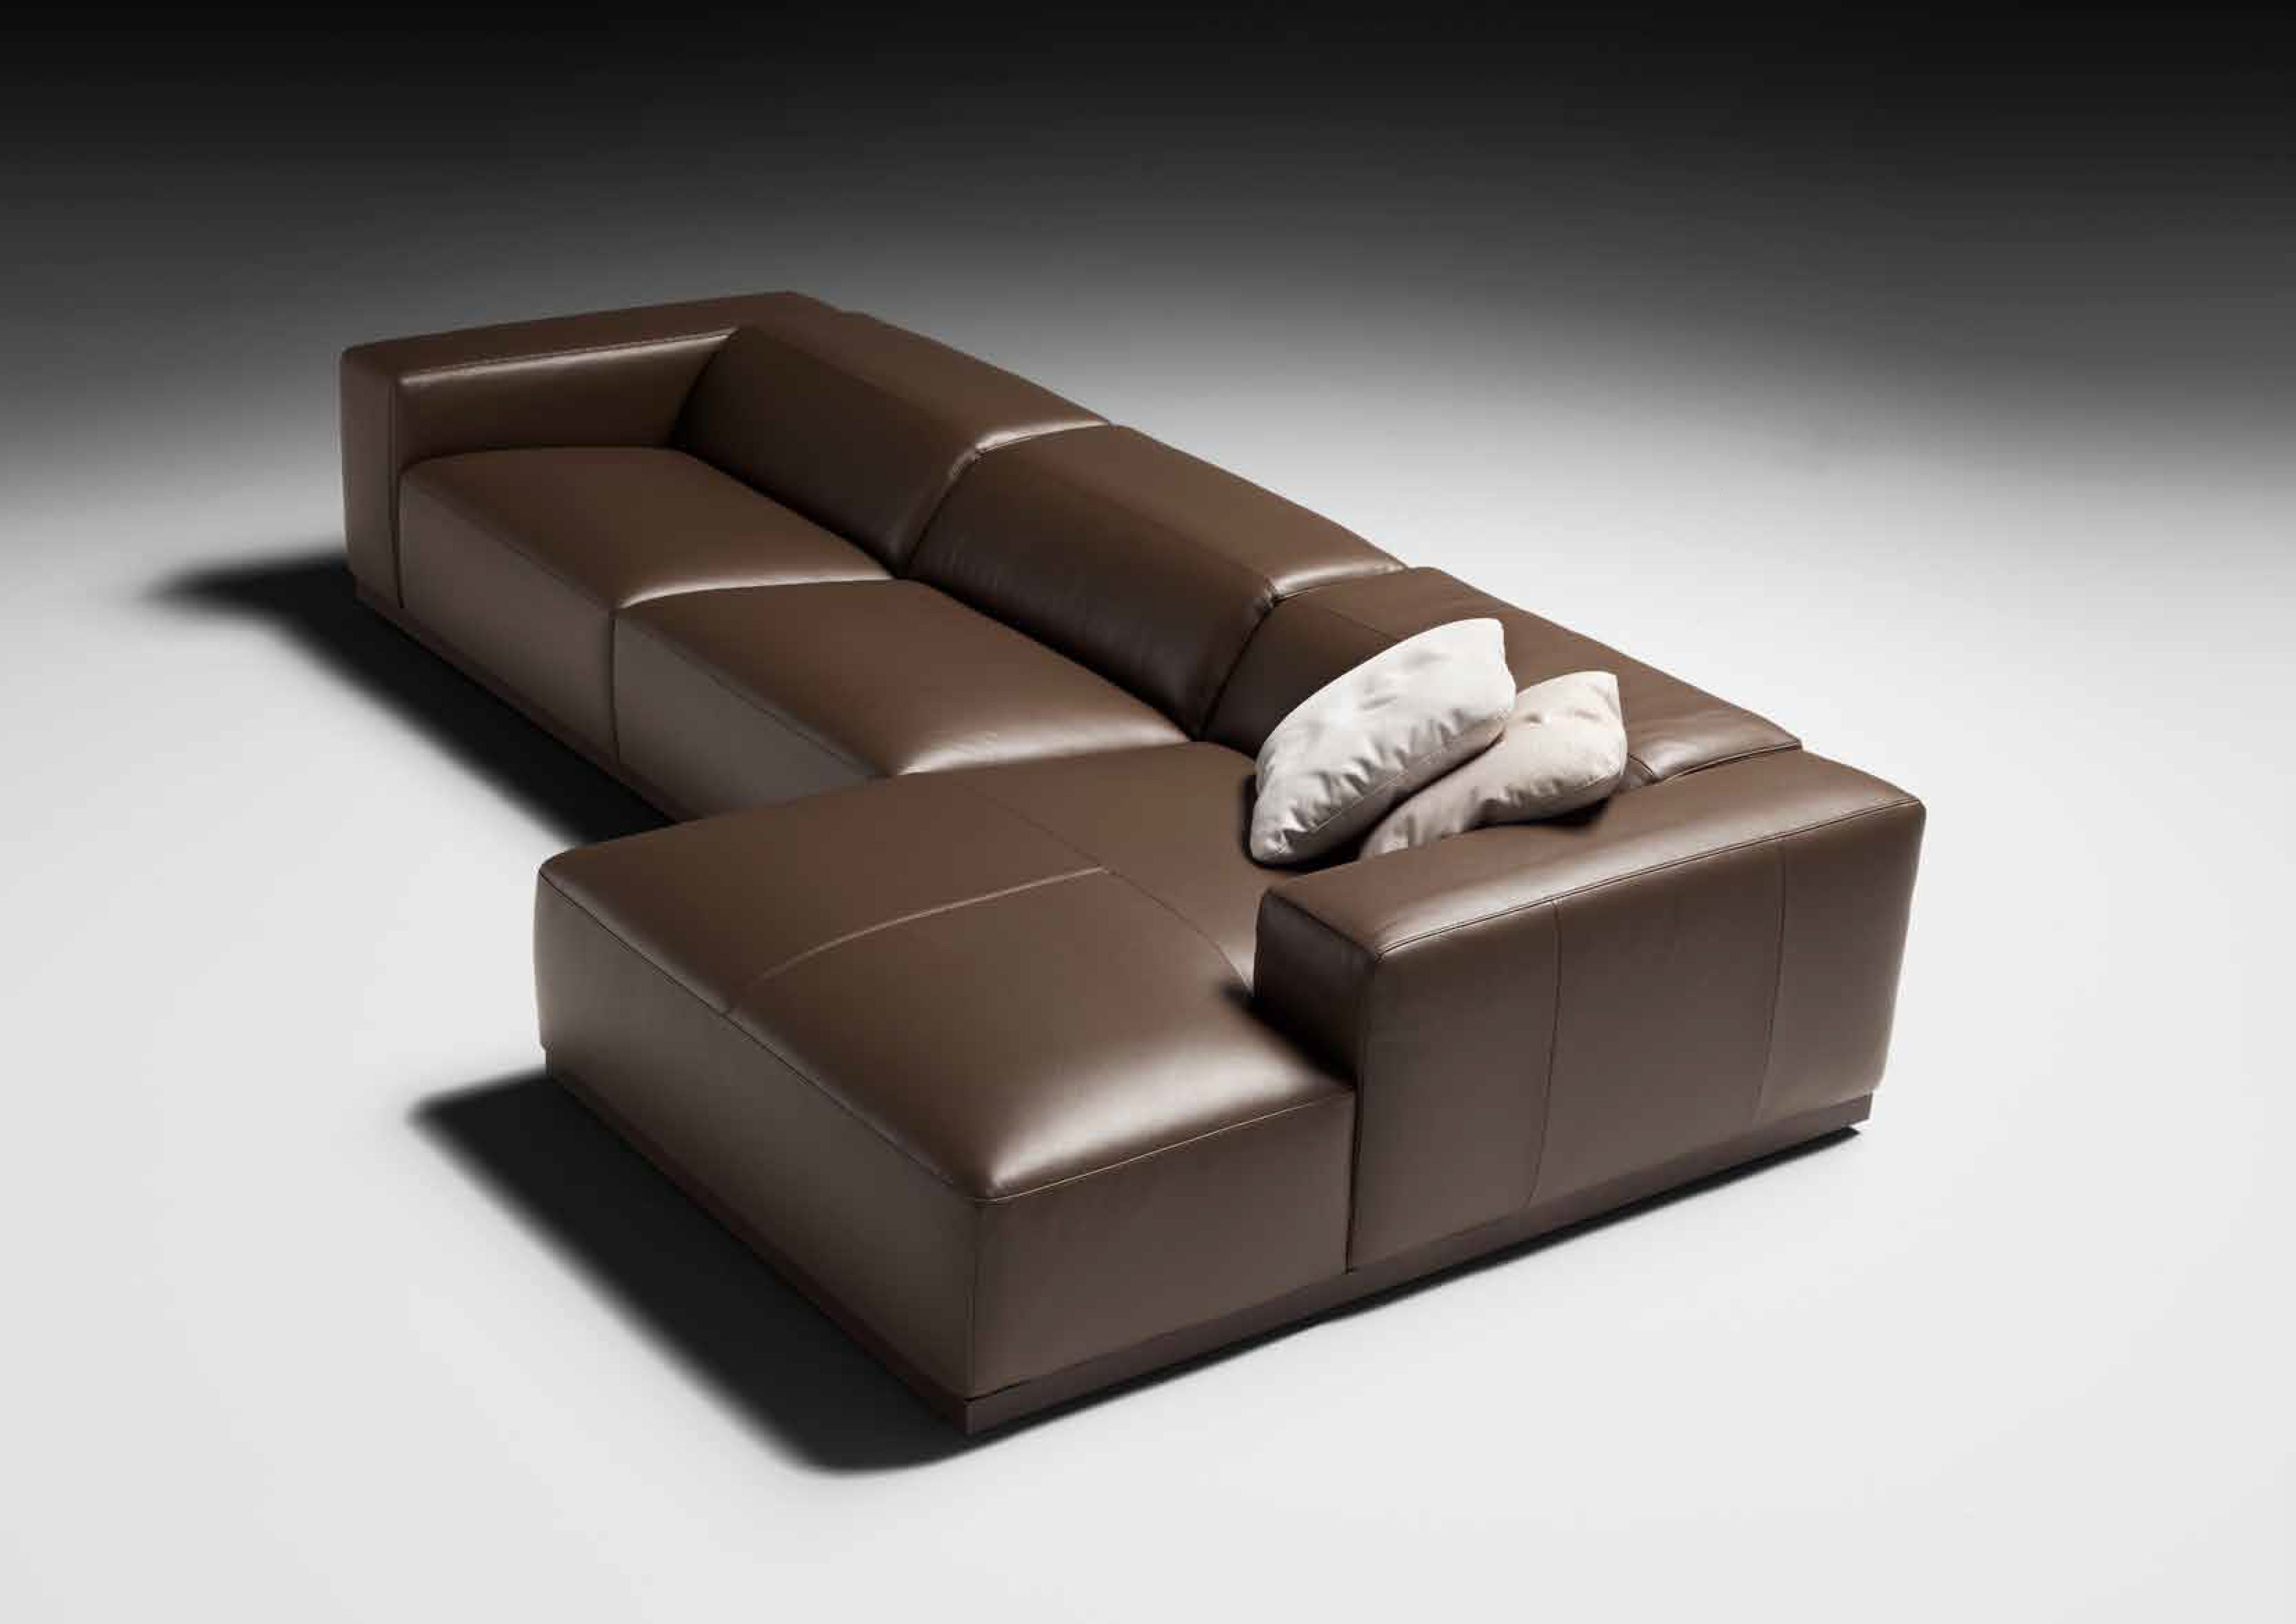 Fabio And Co Is Proud To Offer You 100 Genuine Italian Sofas Over 200 Exclusive Models To Choos Italian Leather Sofa Italian Furniture Modern Italian Sofa